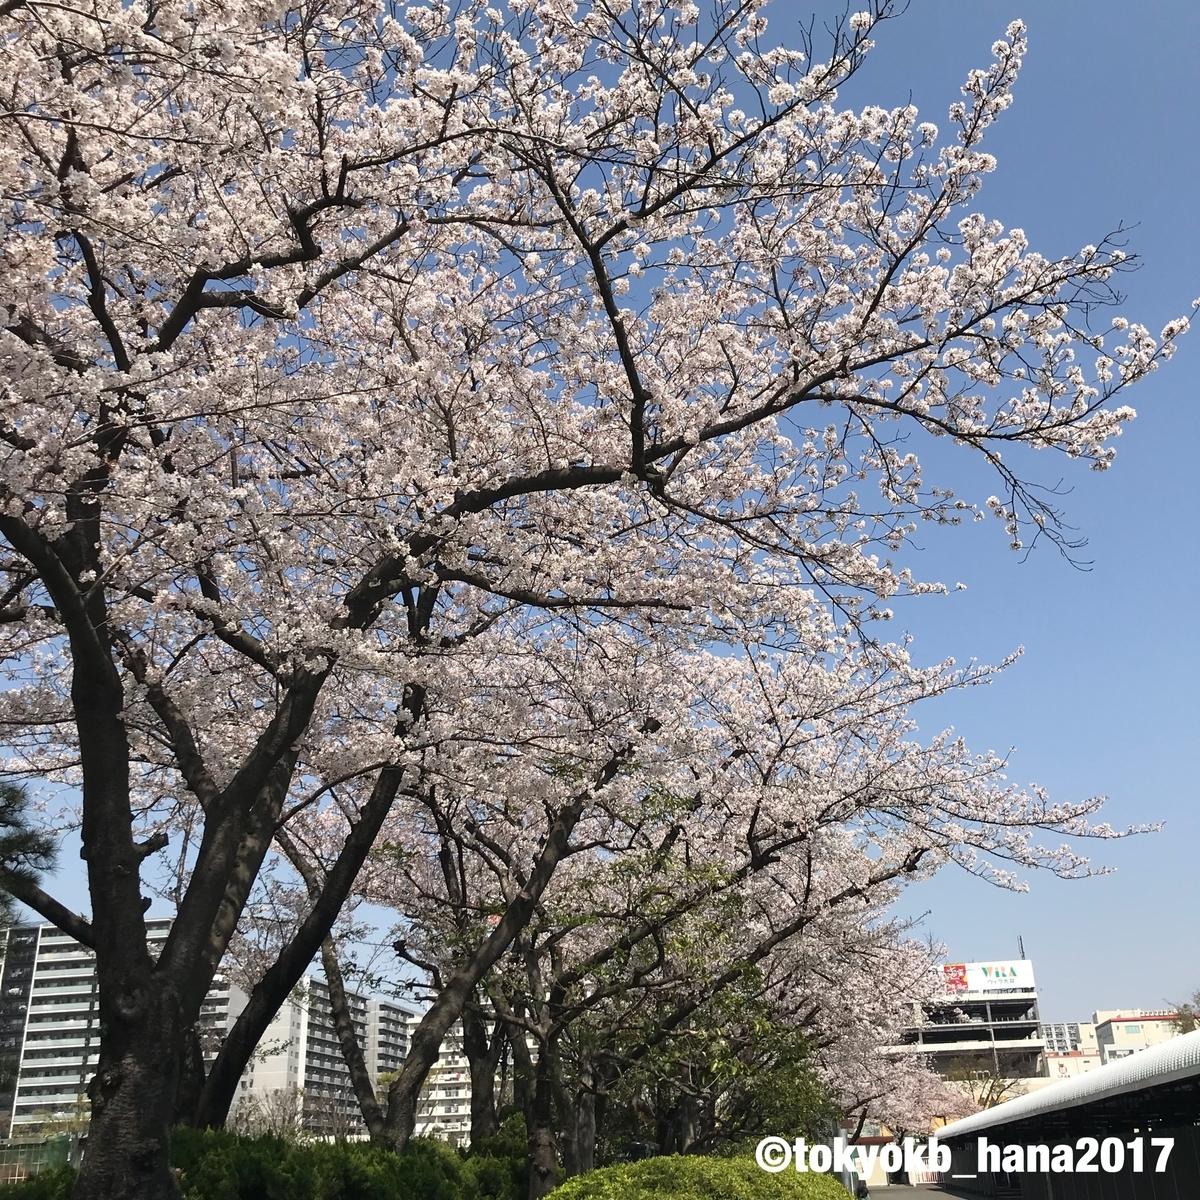 f:id:tokyokb_hana2017:20190406152918j:plain